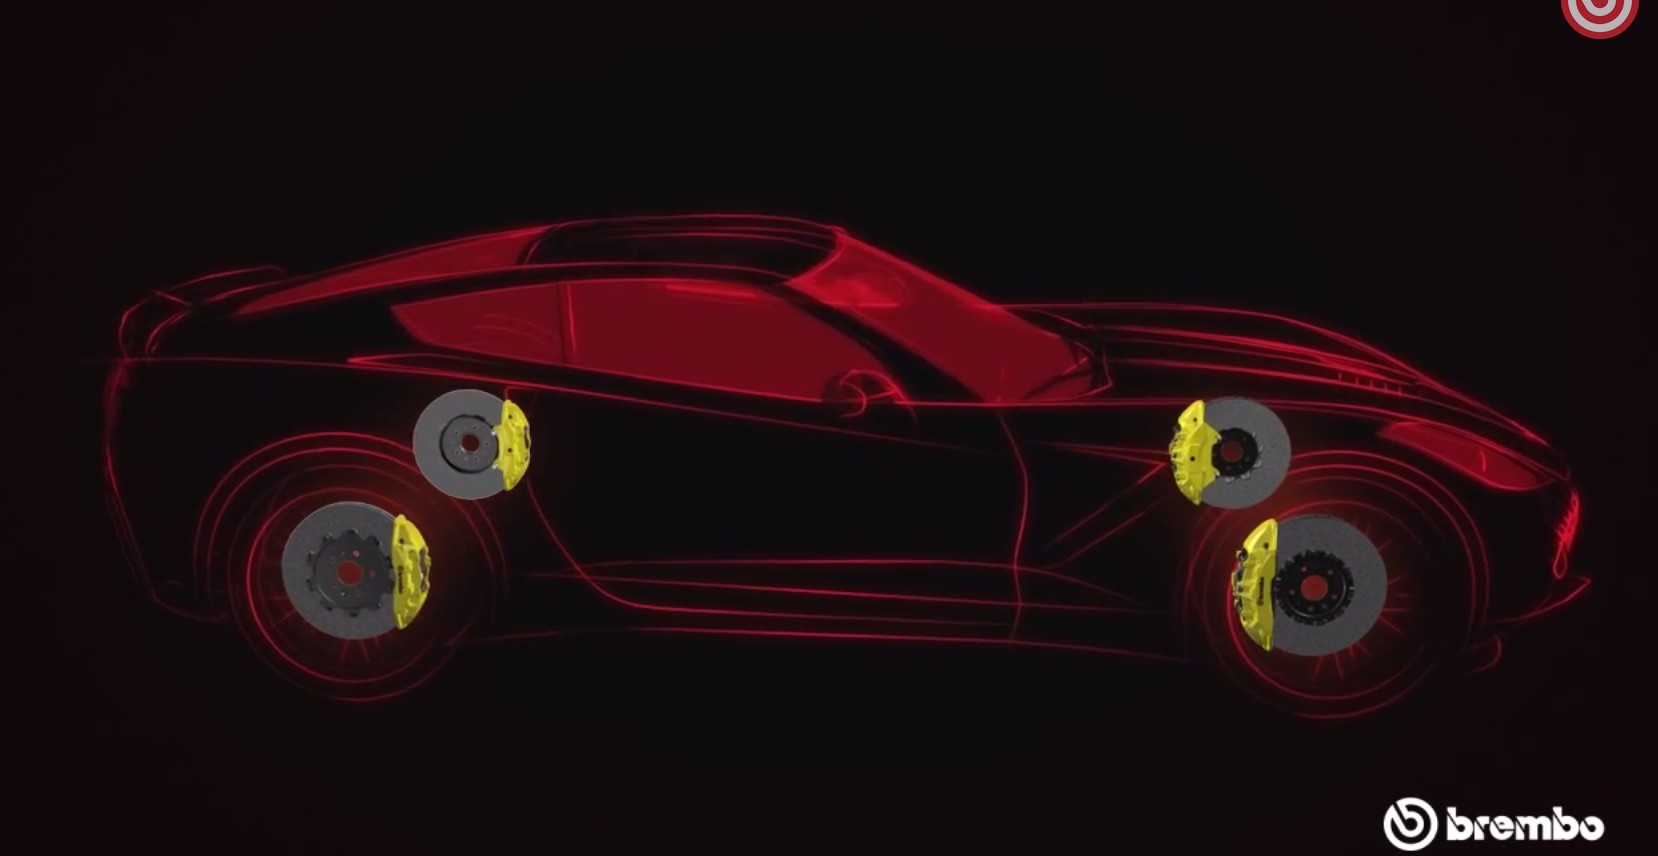 The Tech Behind The 2015 Corvette Z06's Brembo Carbon Ceramic Brakes: Video